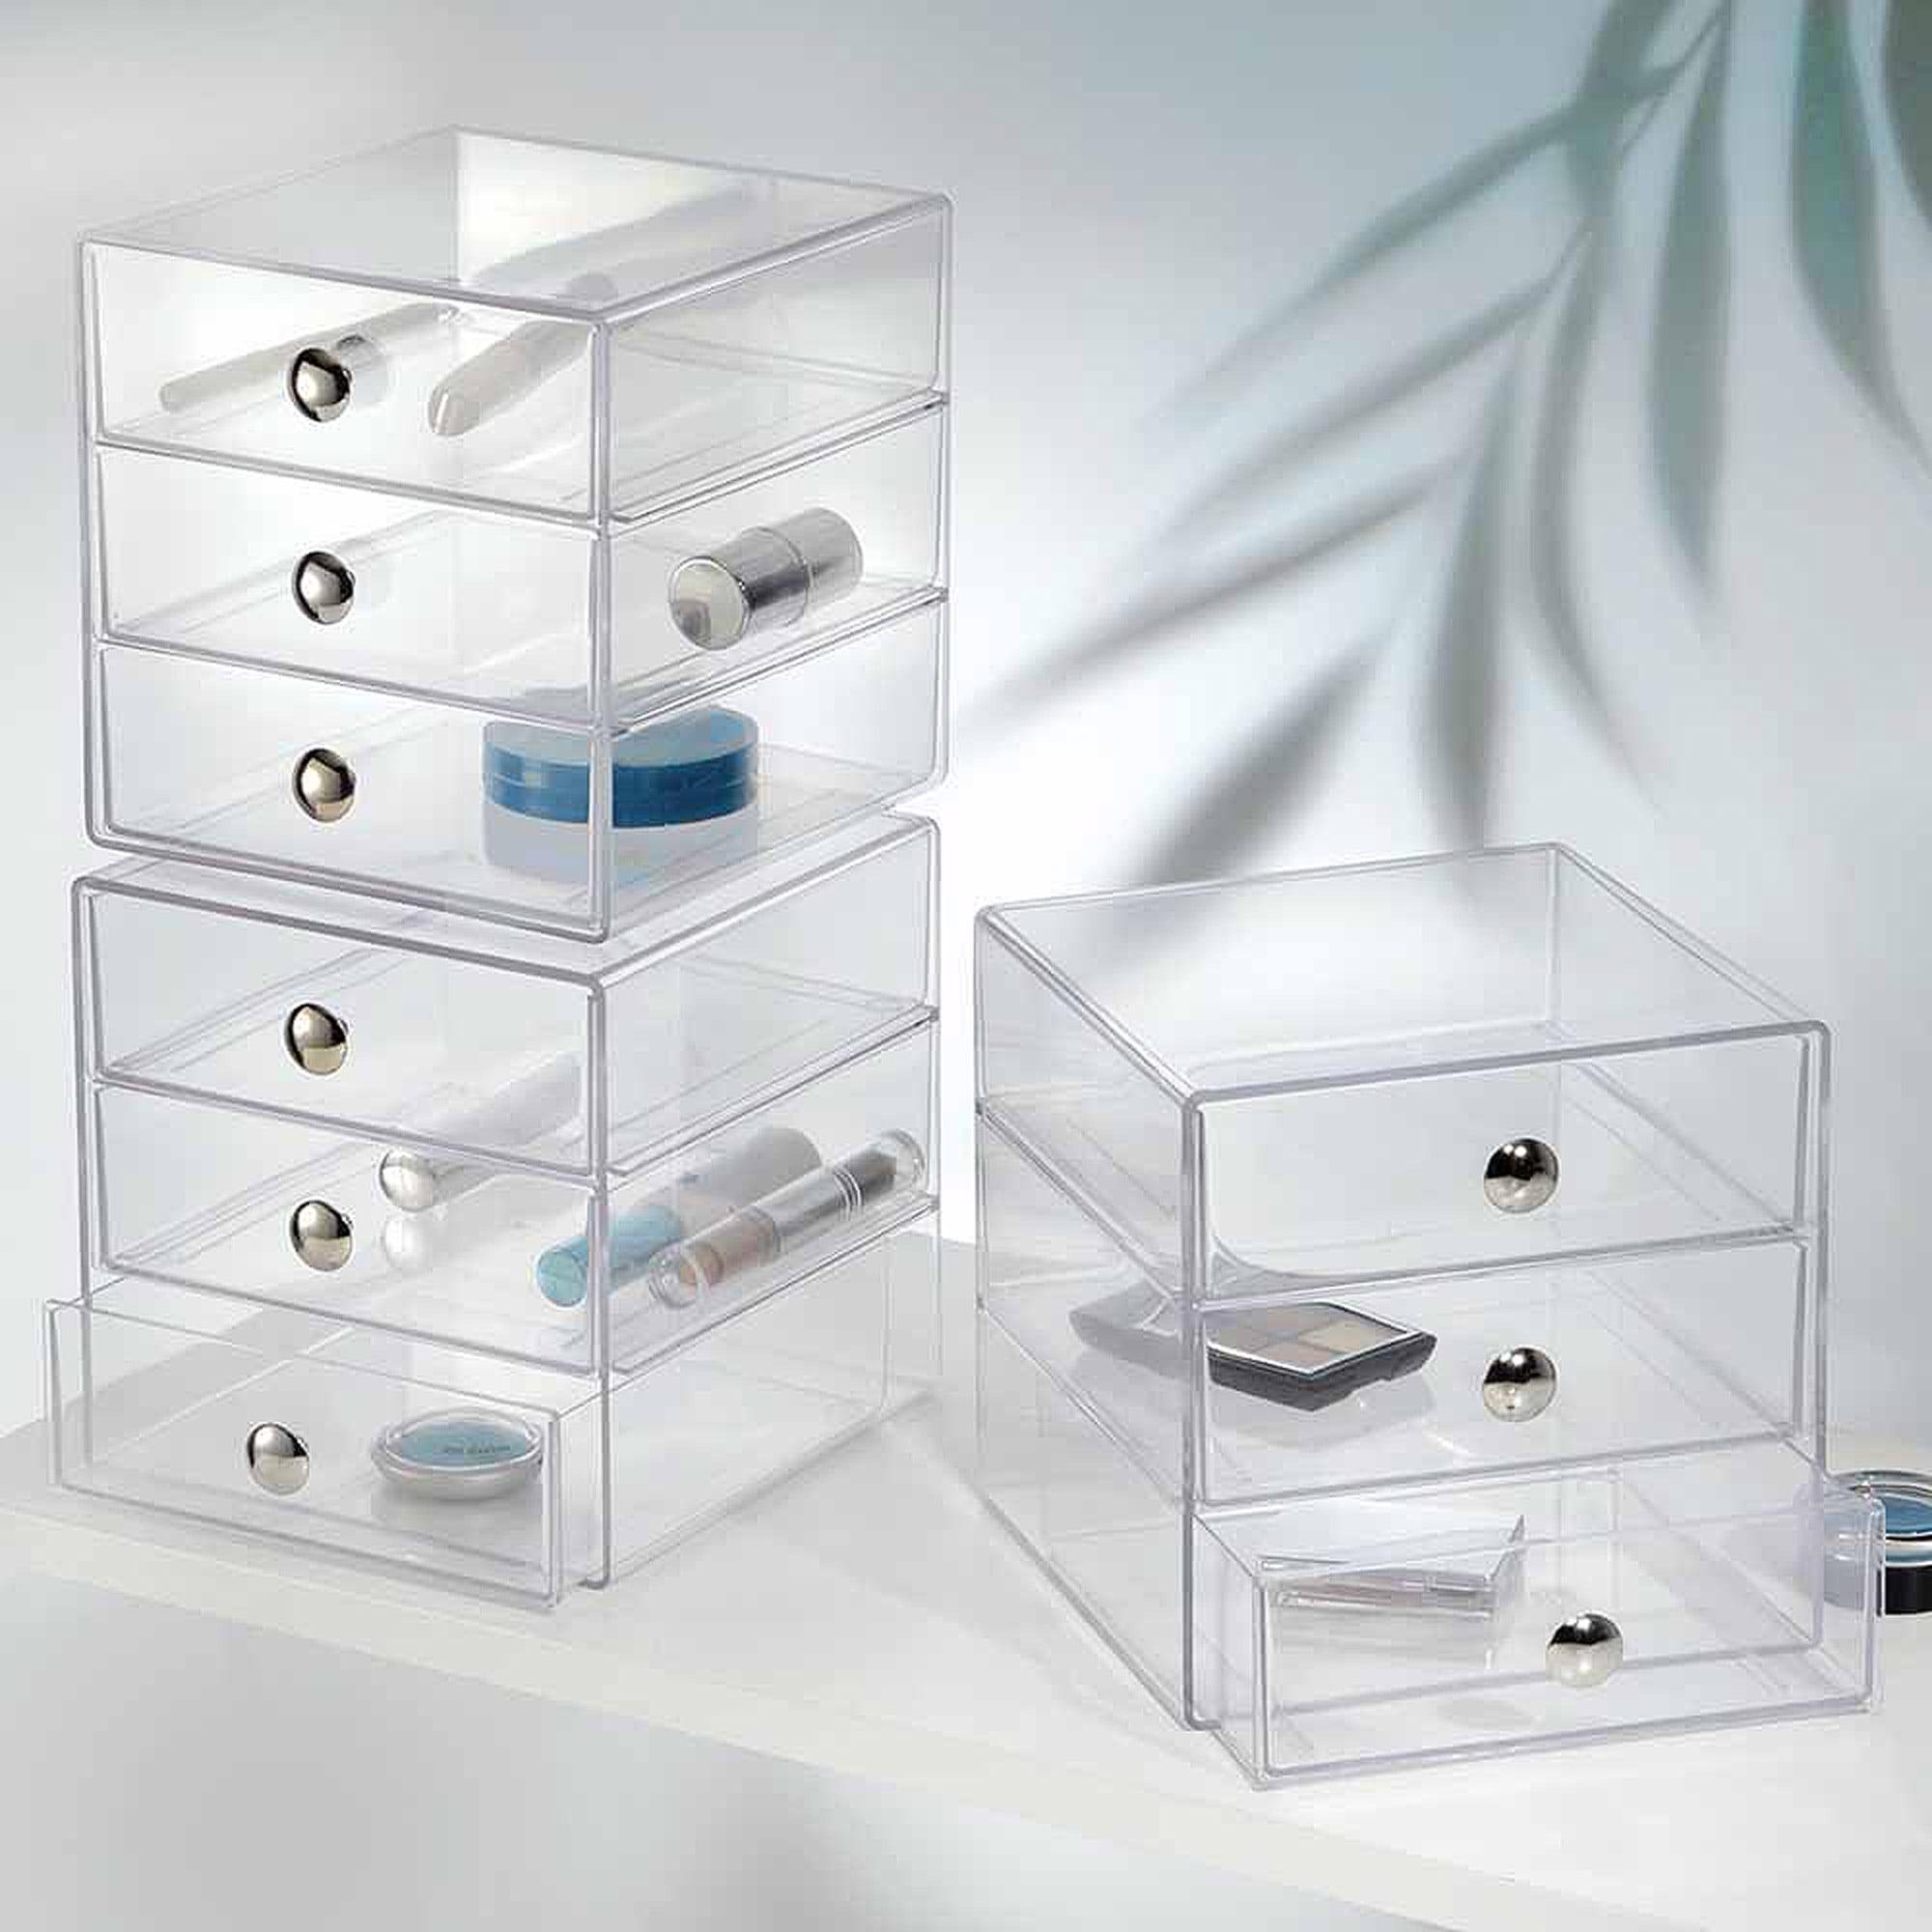 makeup storage show sizes adjustable font drawer organizer m